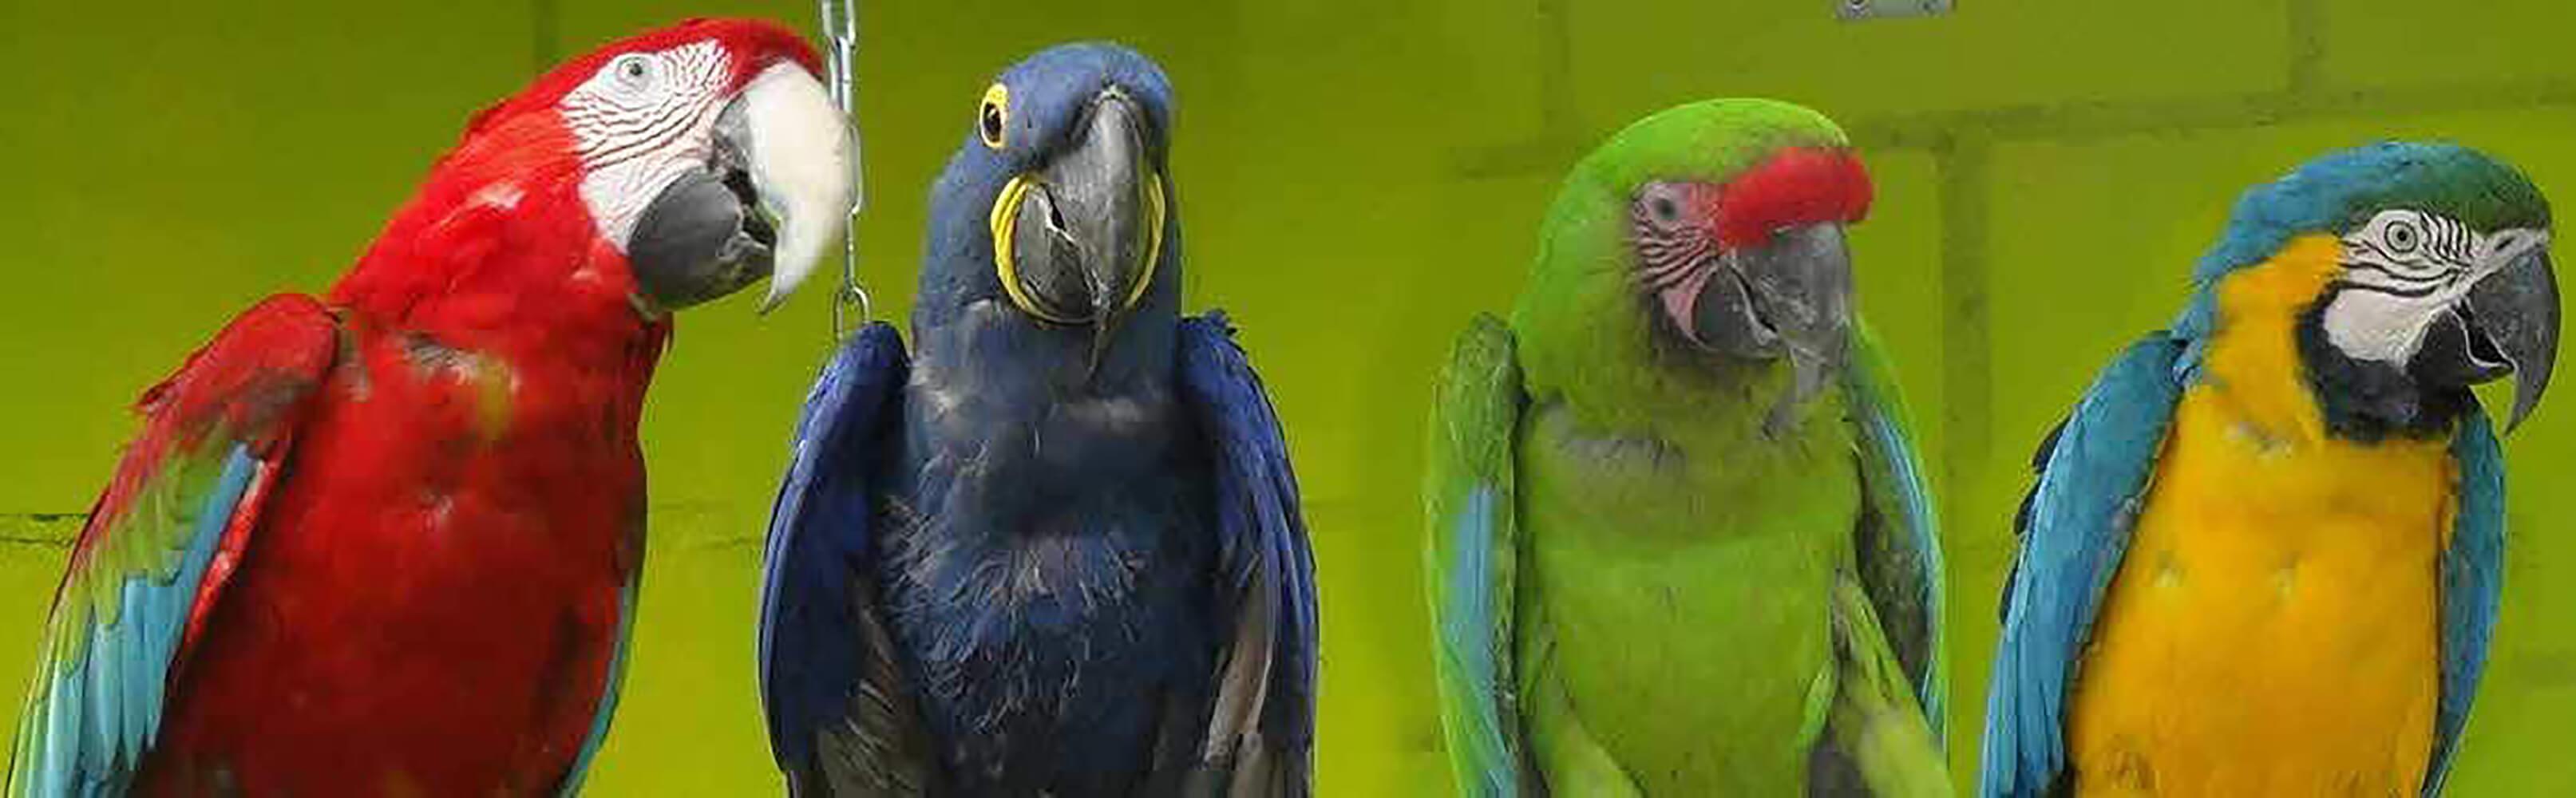 Vogelpark Ambigua 1